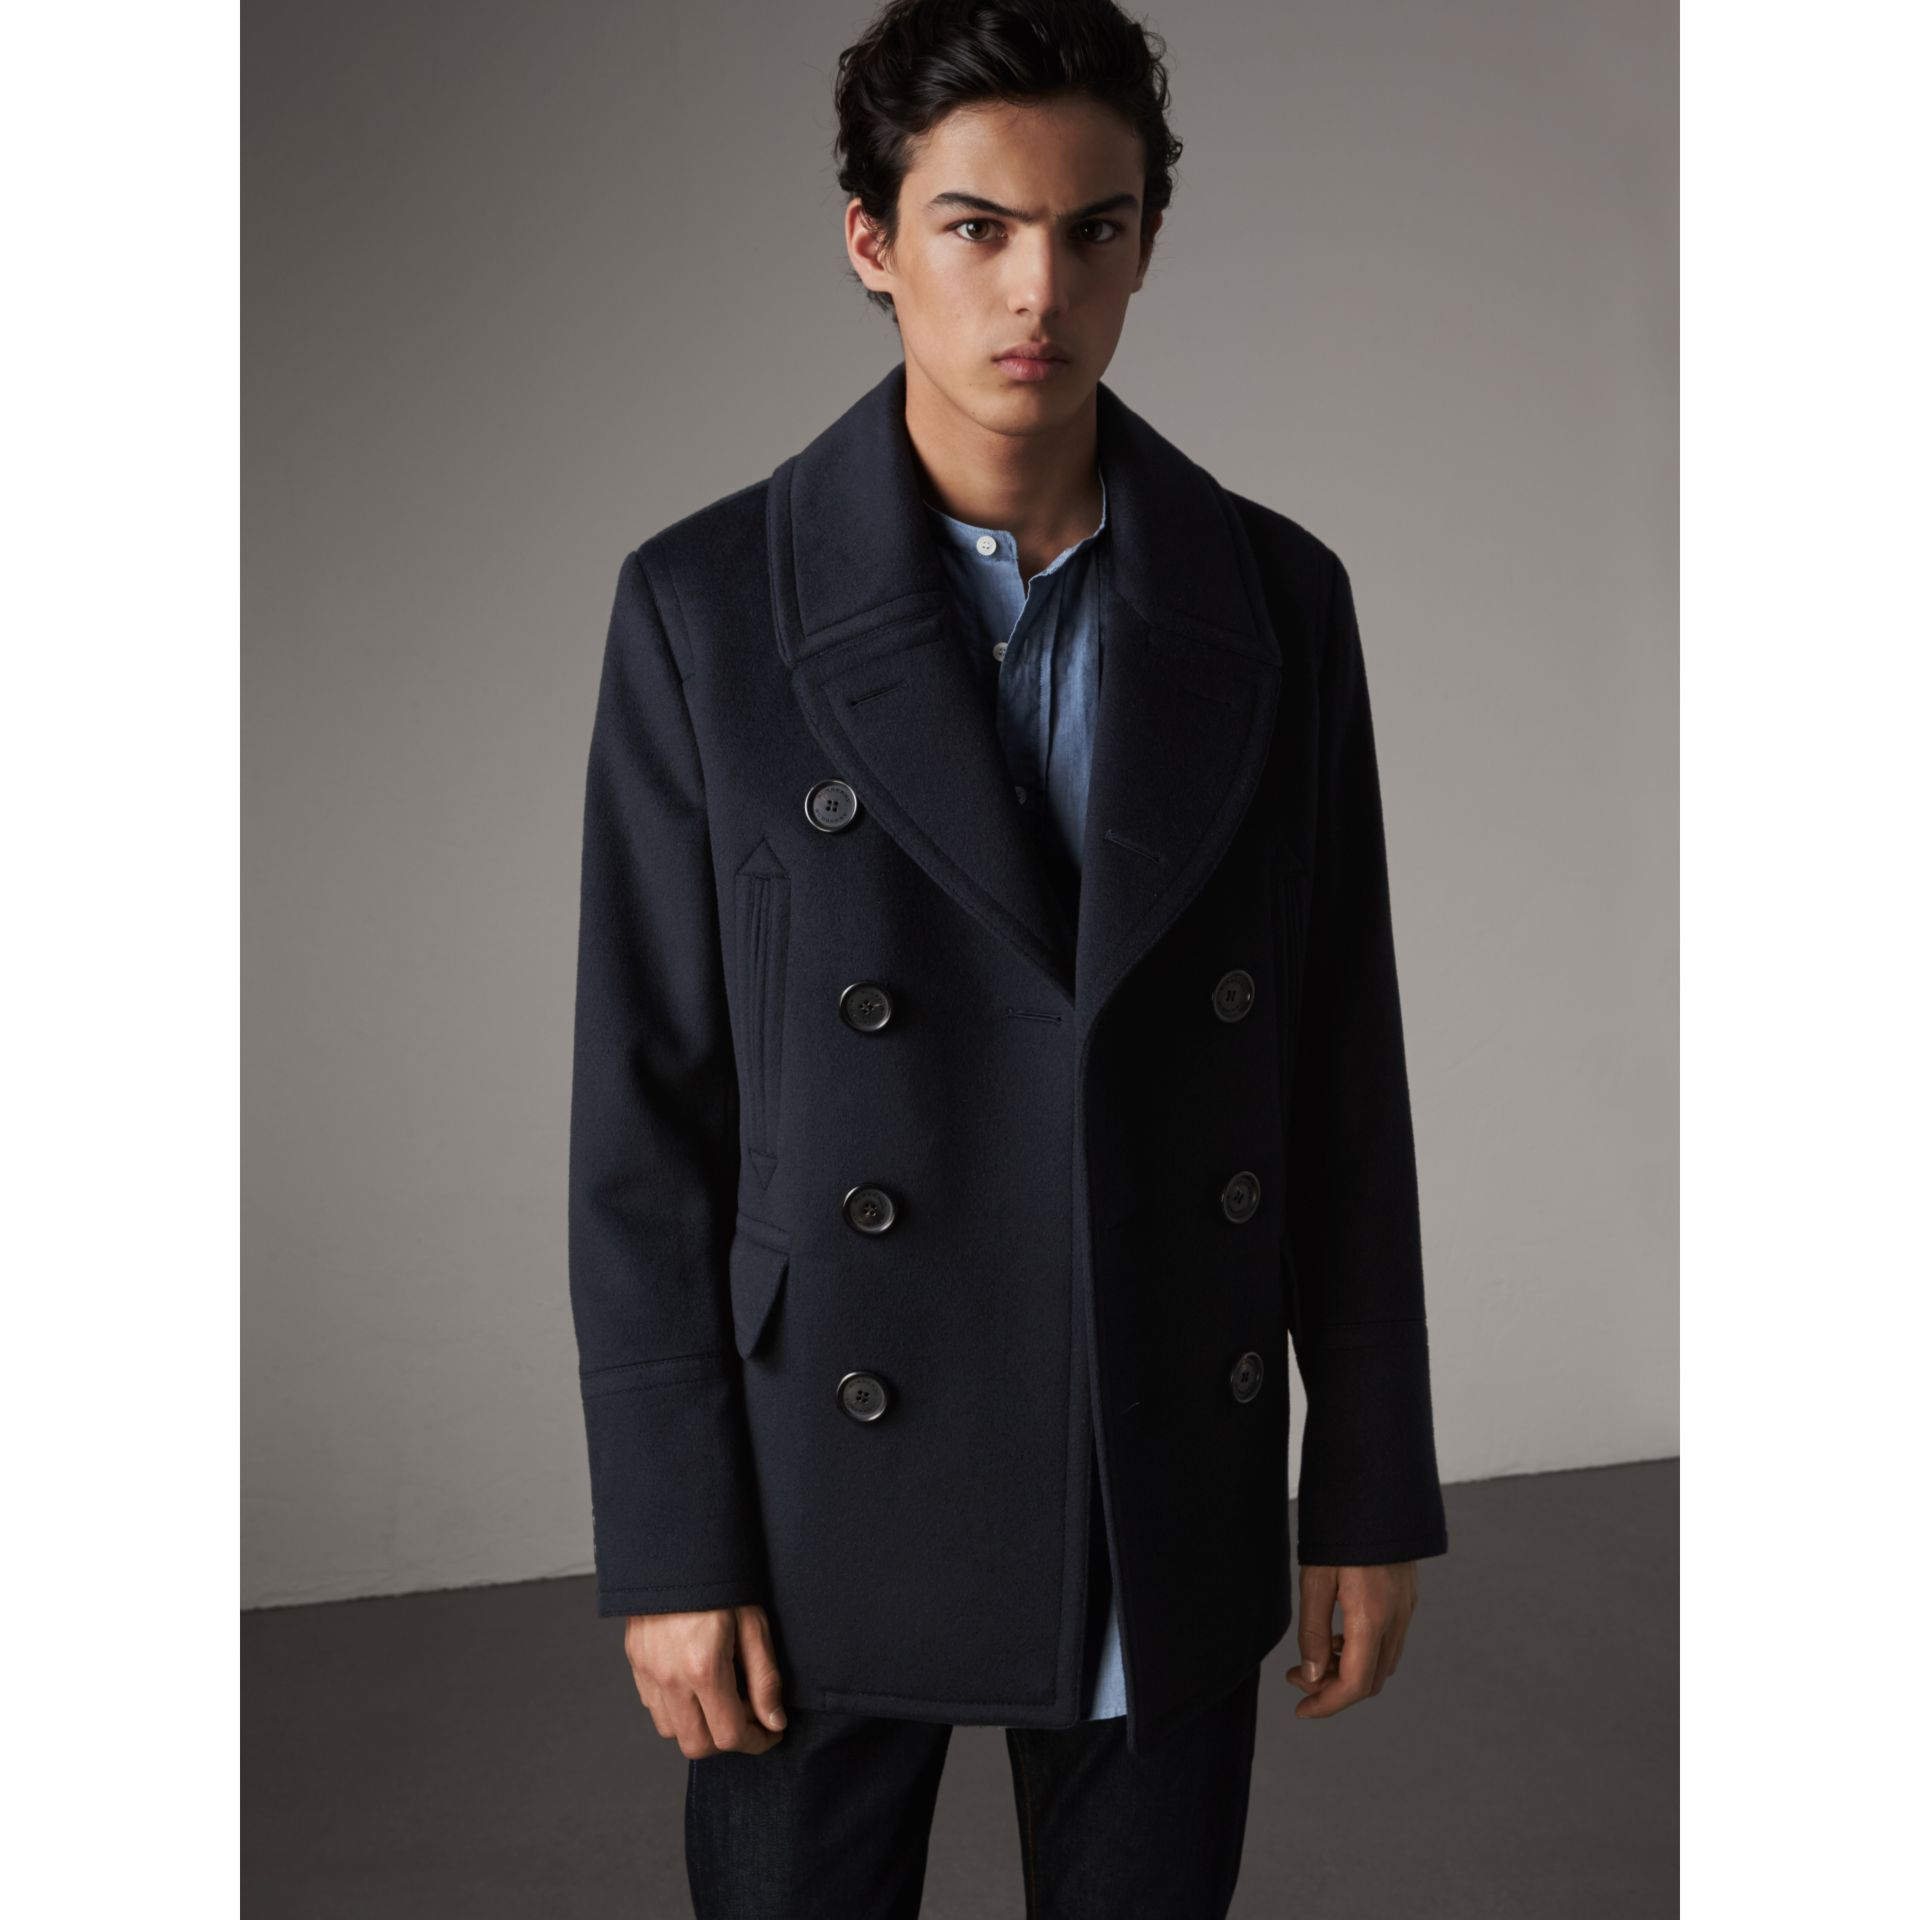 b2de8e7e9c52 Burberry Women S Outerwear Coats Jackets Nordstrom